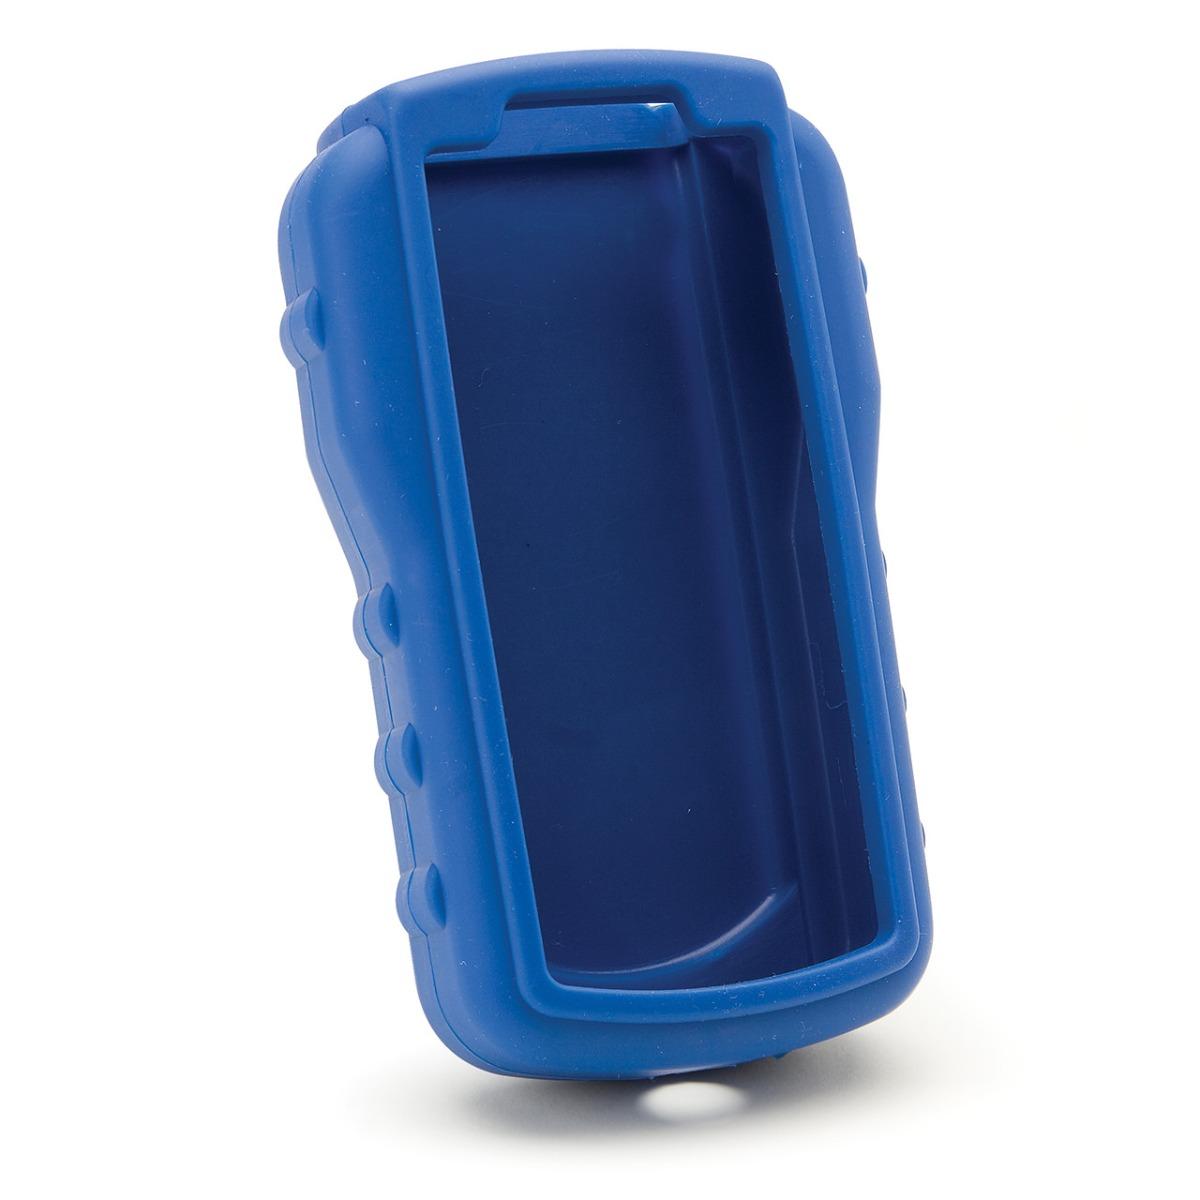 Funda de Goma a Prueba de Golpes (Azul) - HI710007